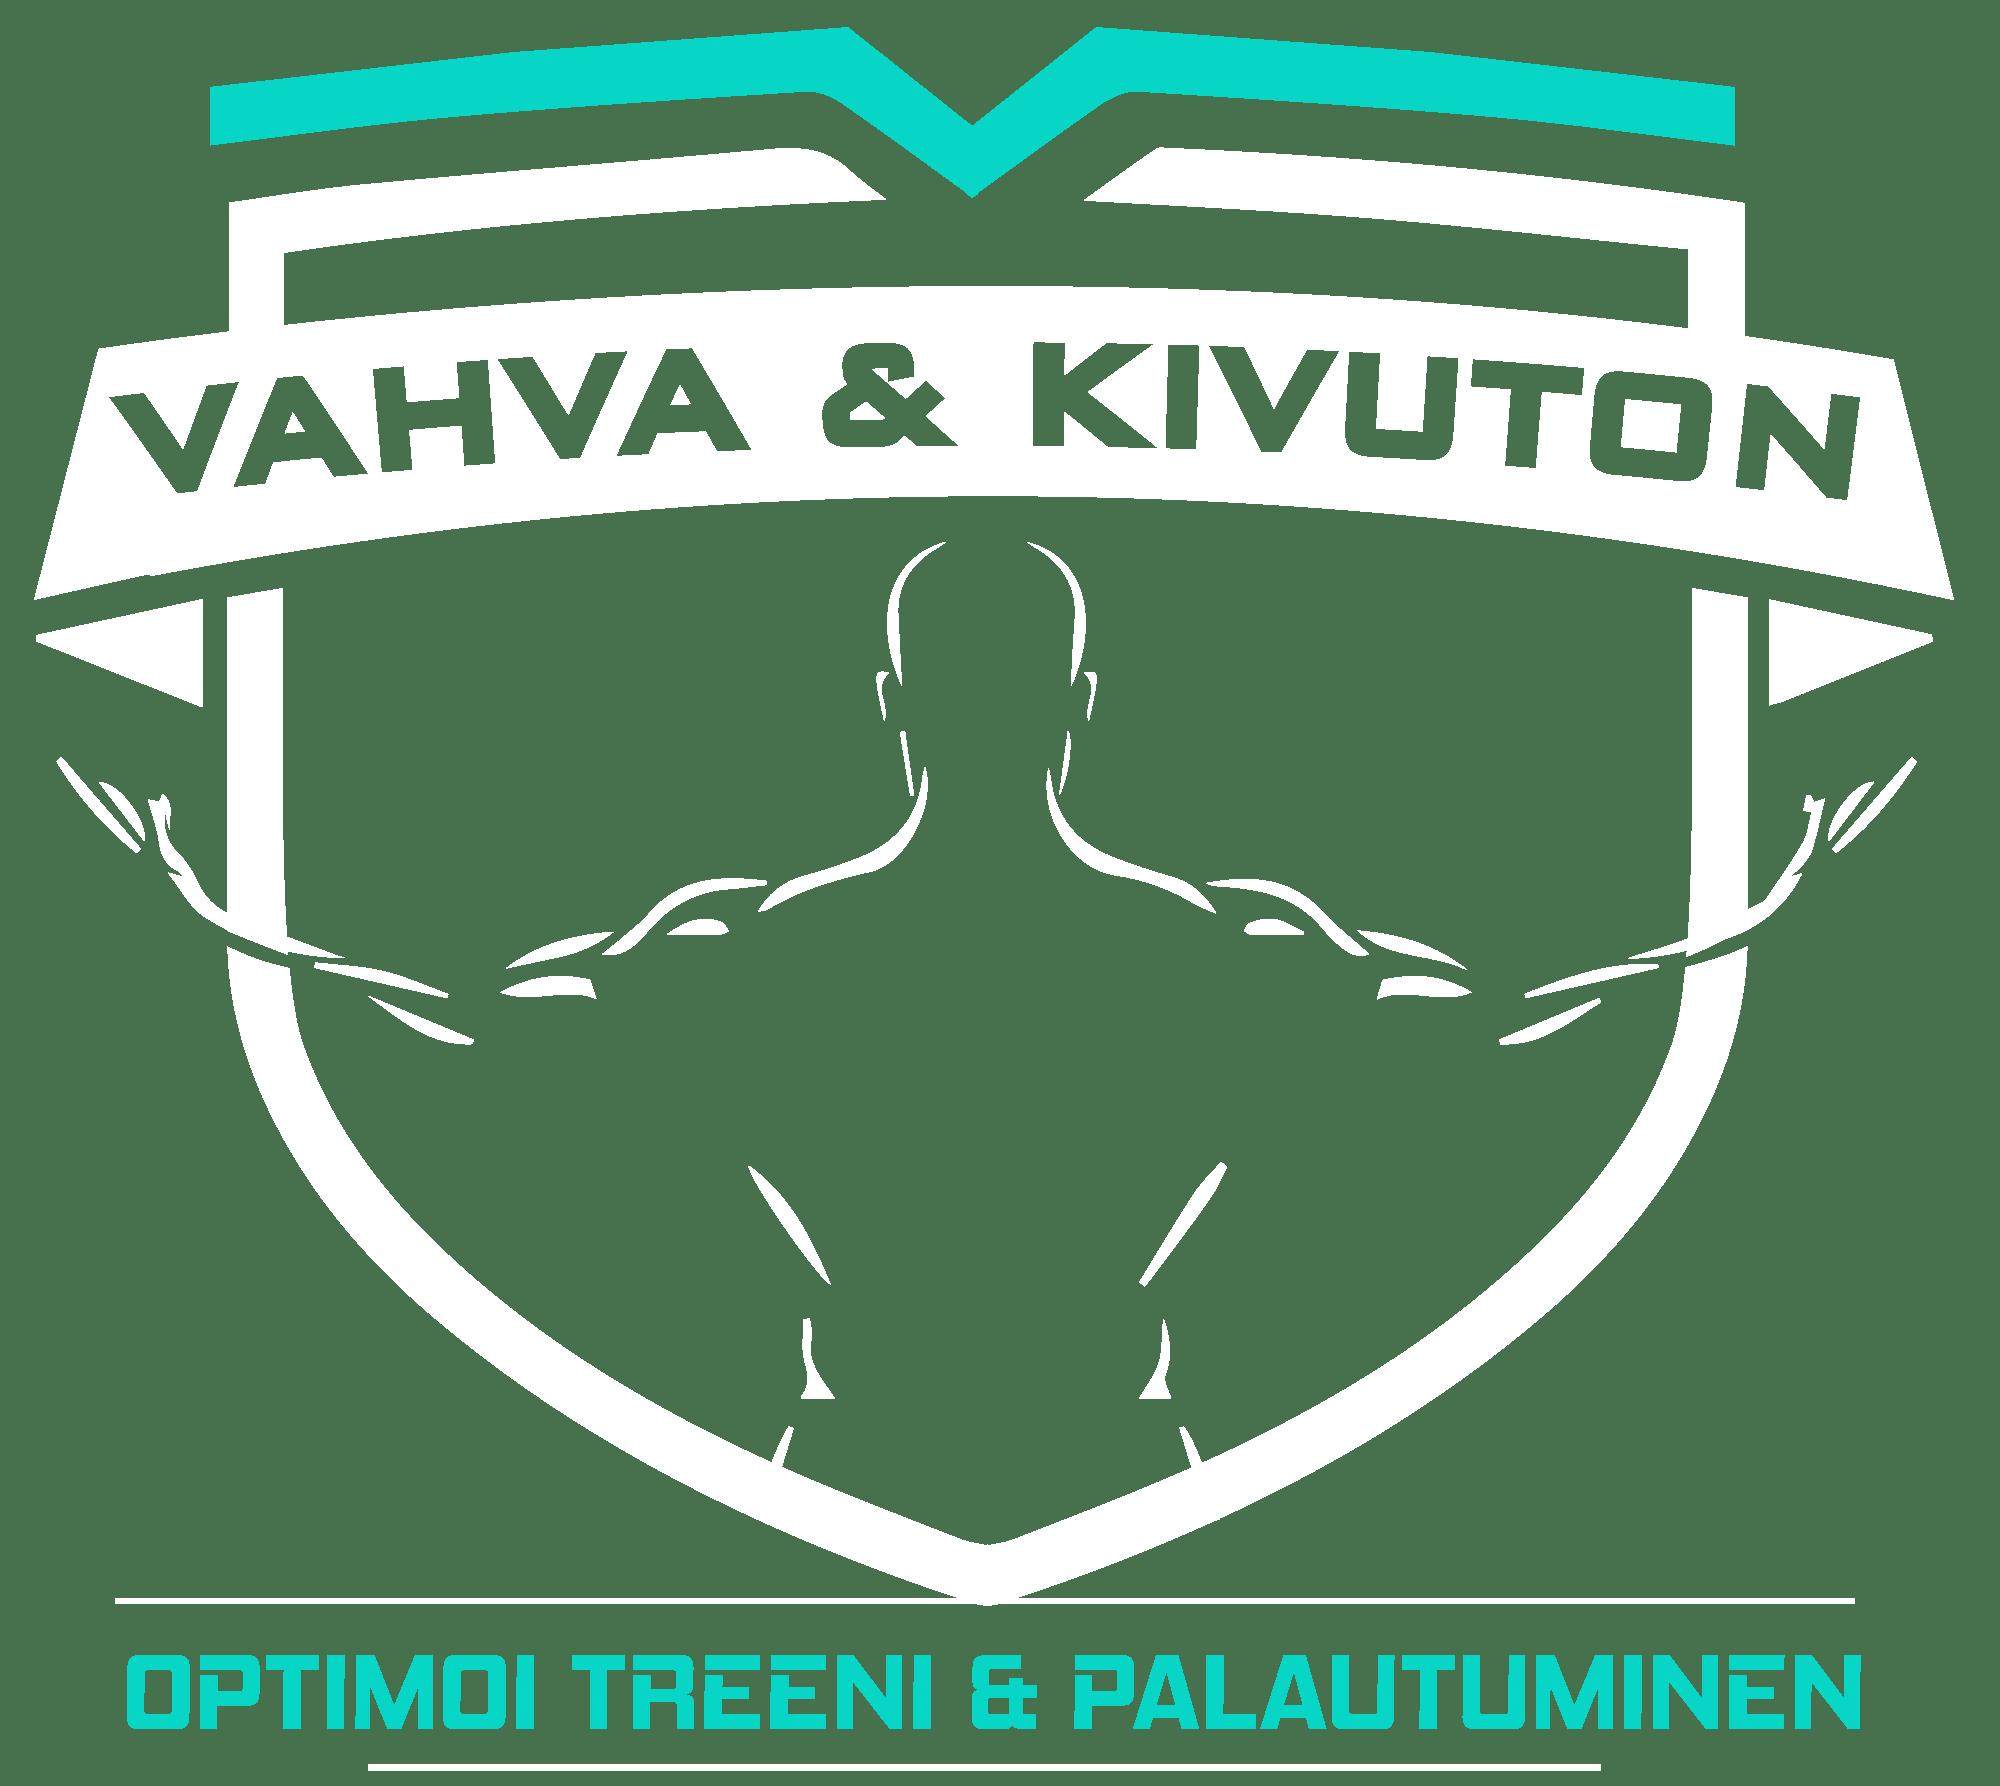 Vahva Kivuton logo